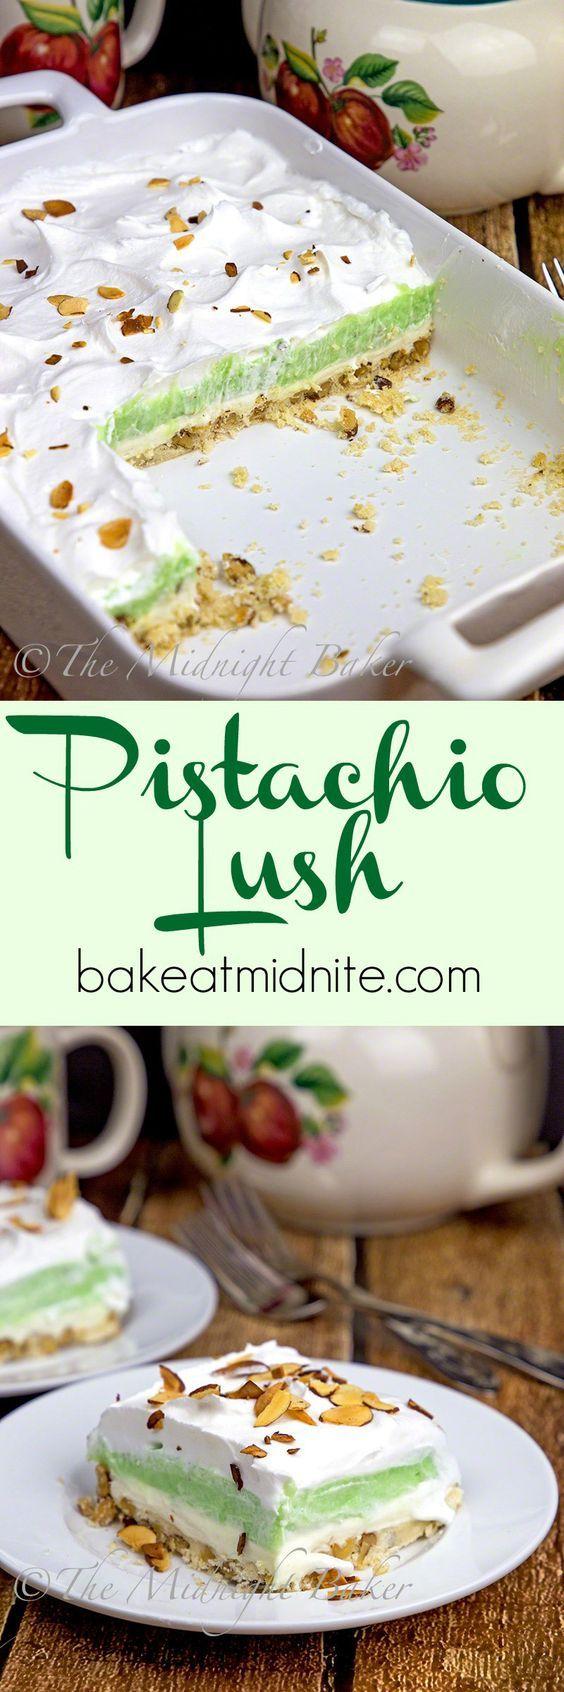 Pistachio Lush | bakeatmidnite.com | #dessert #pistachio #recipe